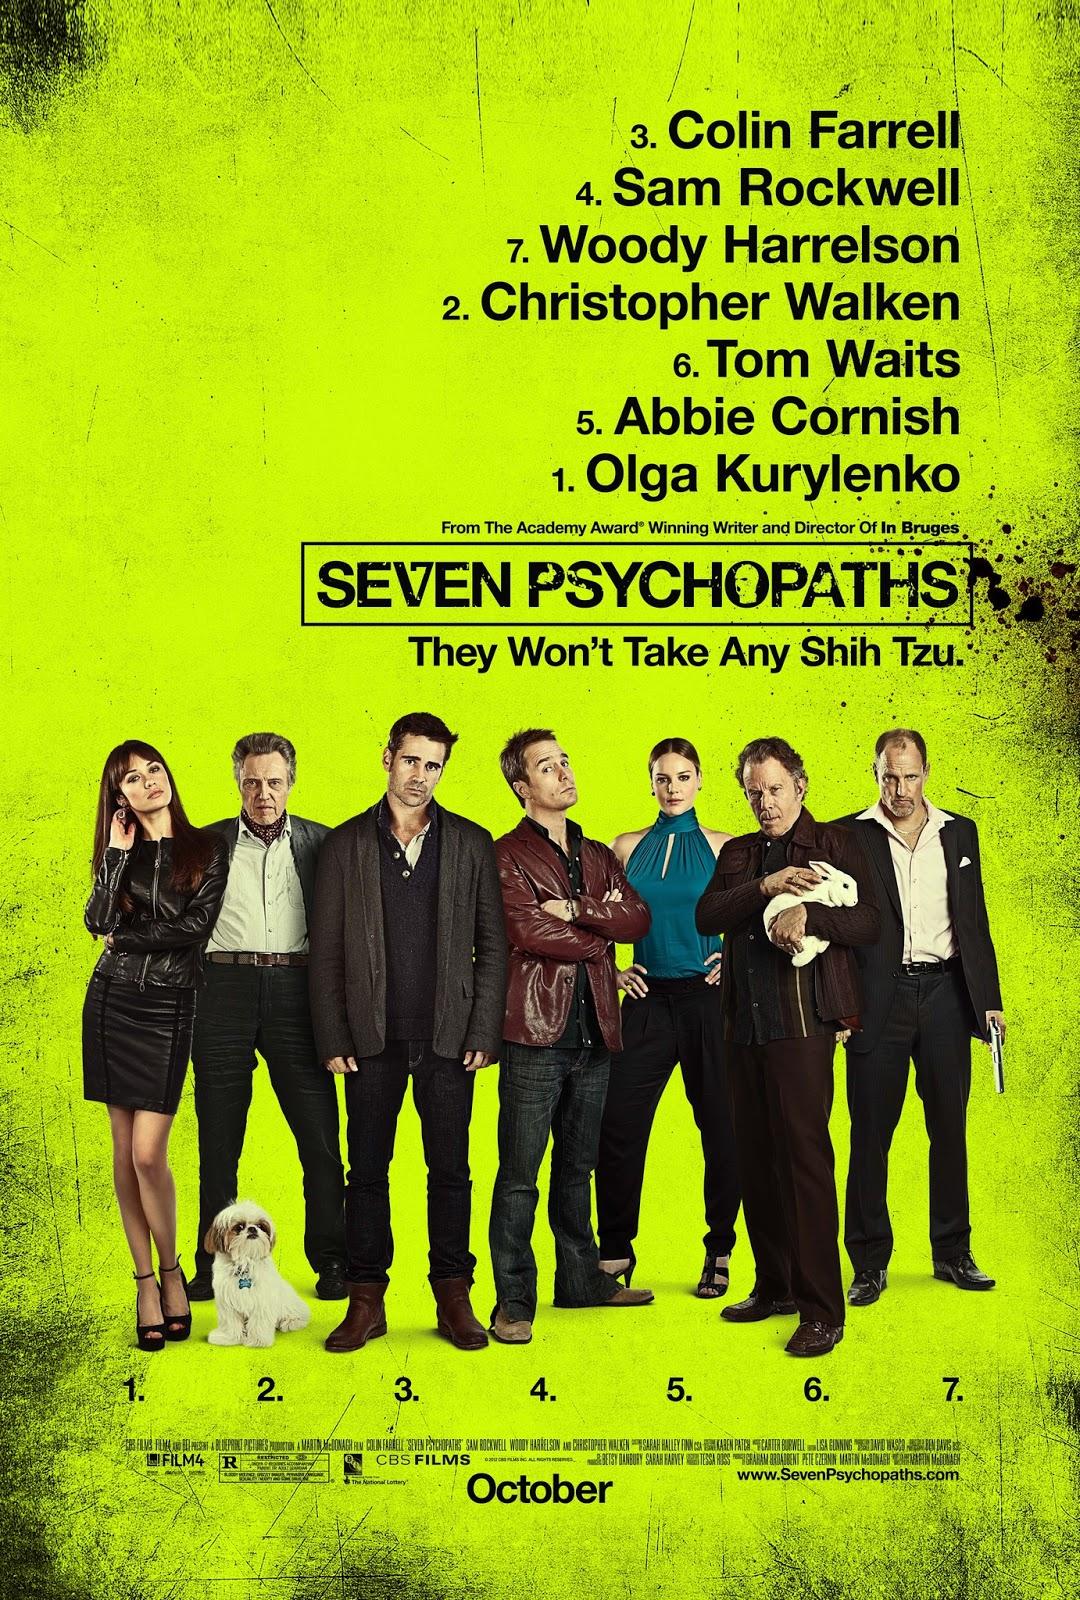 http://3.bp.blogspot.com/-tHEY1CIrcp4/URKcLb6RWvI/AAAAAAAAJLg/EueA5eV2uX8/s1600/seven-psychopaths-filmdoktoru.jpg